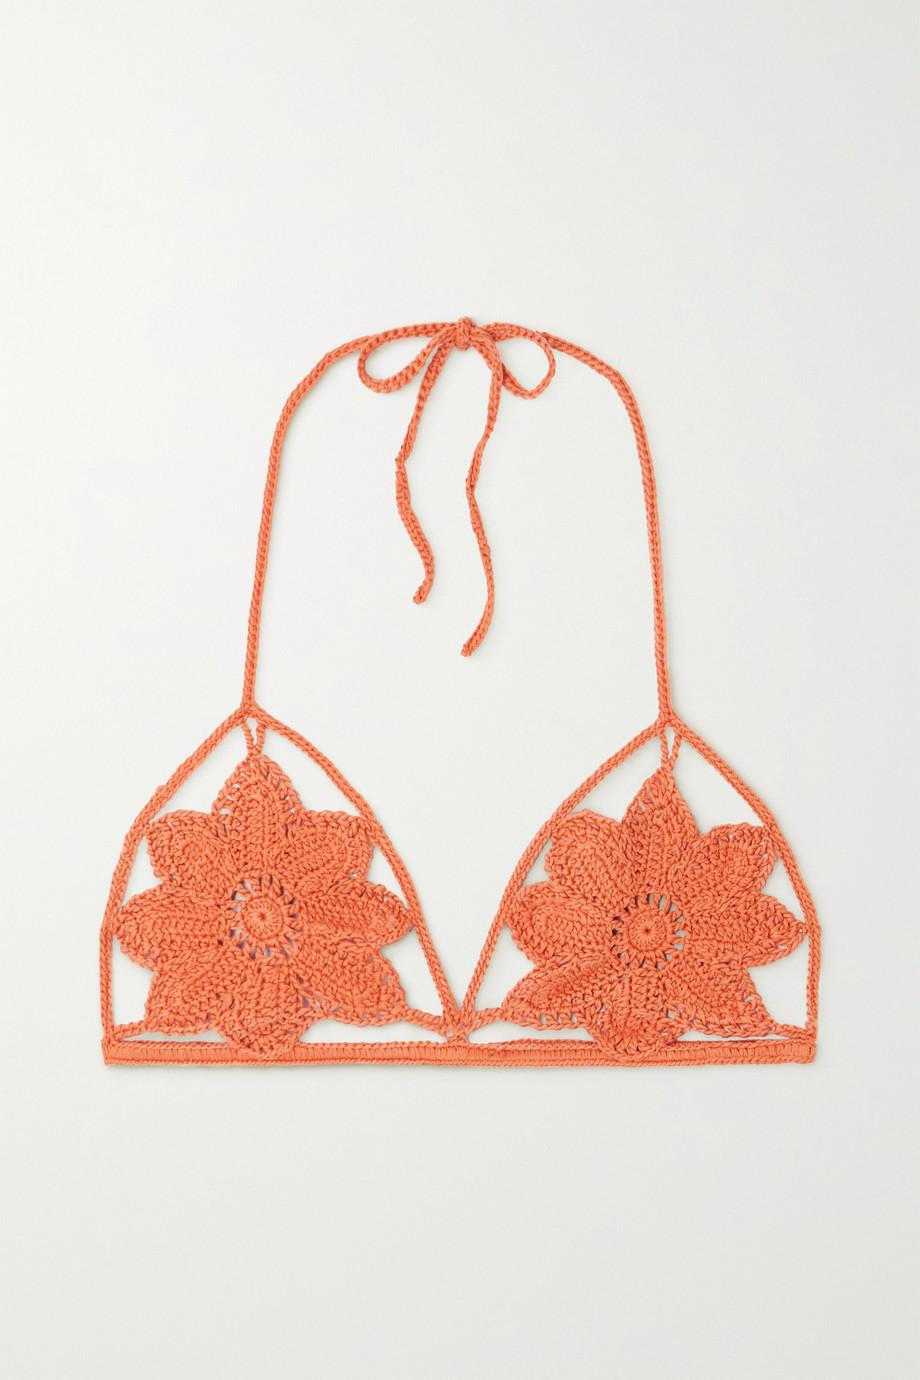 Cult Gaia Dylan crocheted cotton halterneck bikini top